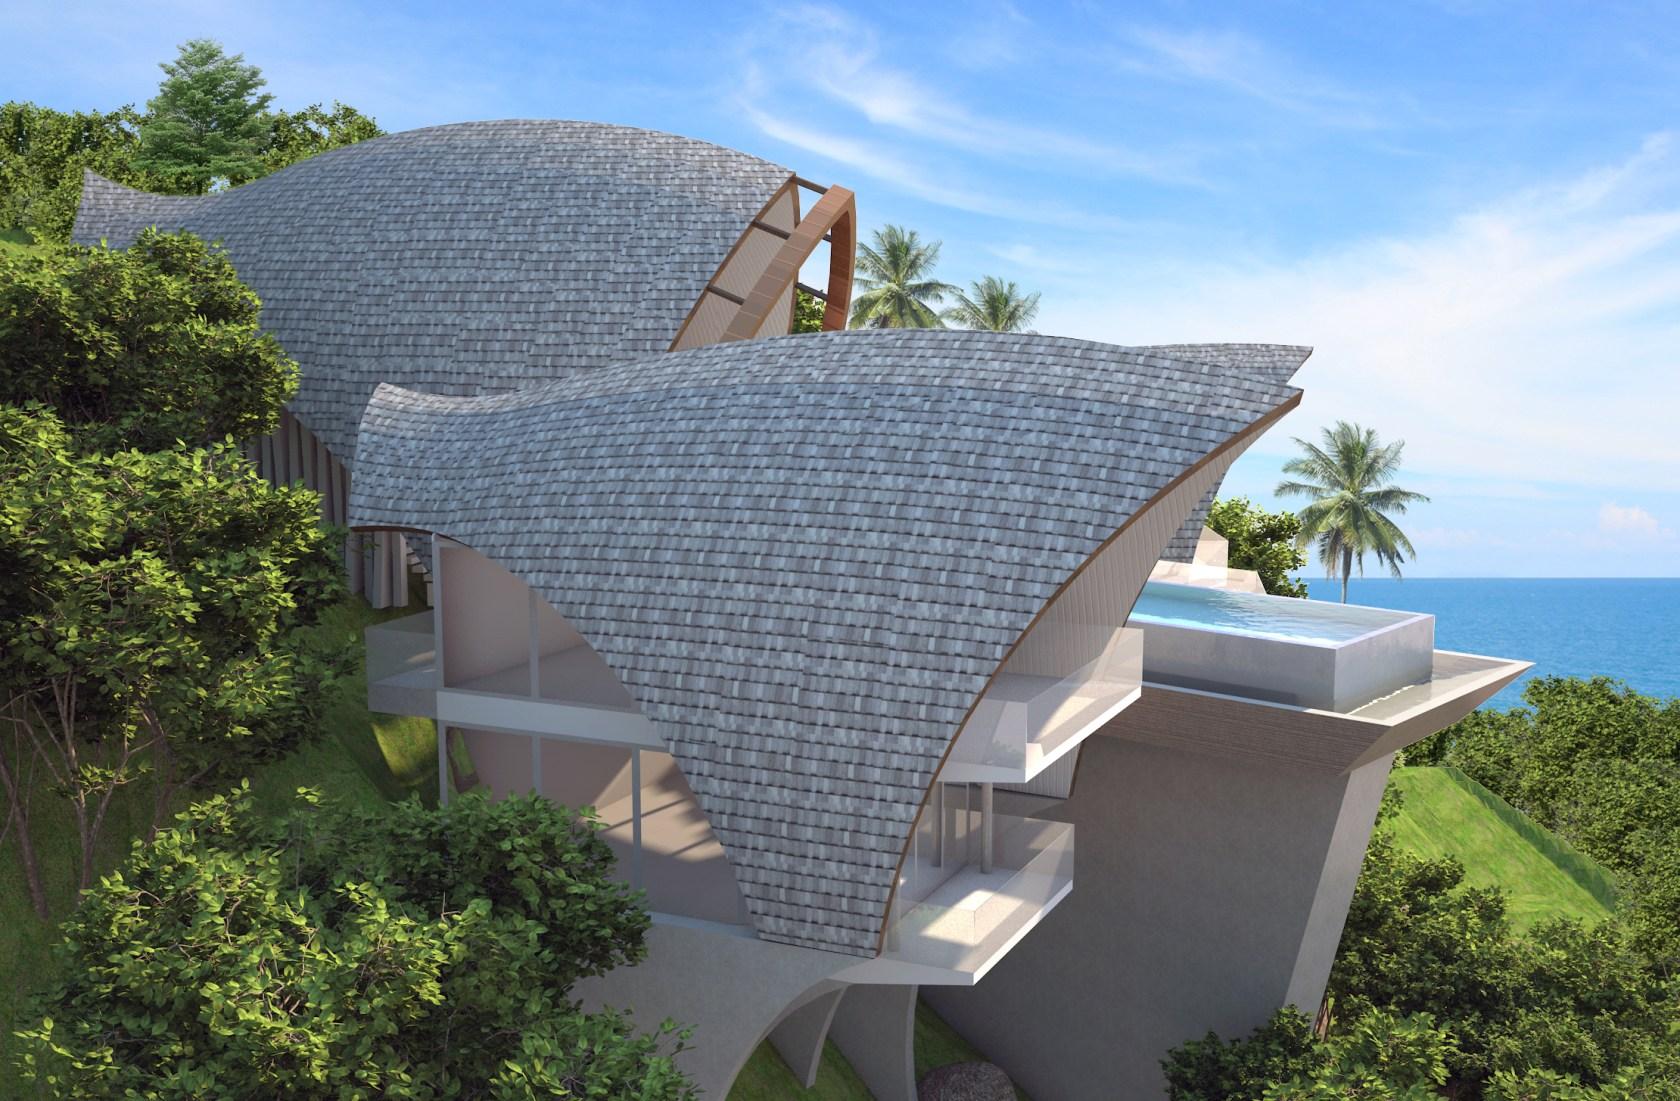 Flying Villa Samui Thailand. - Architizer